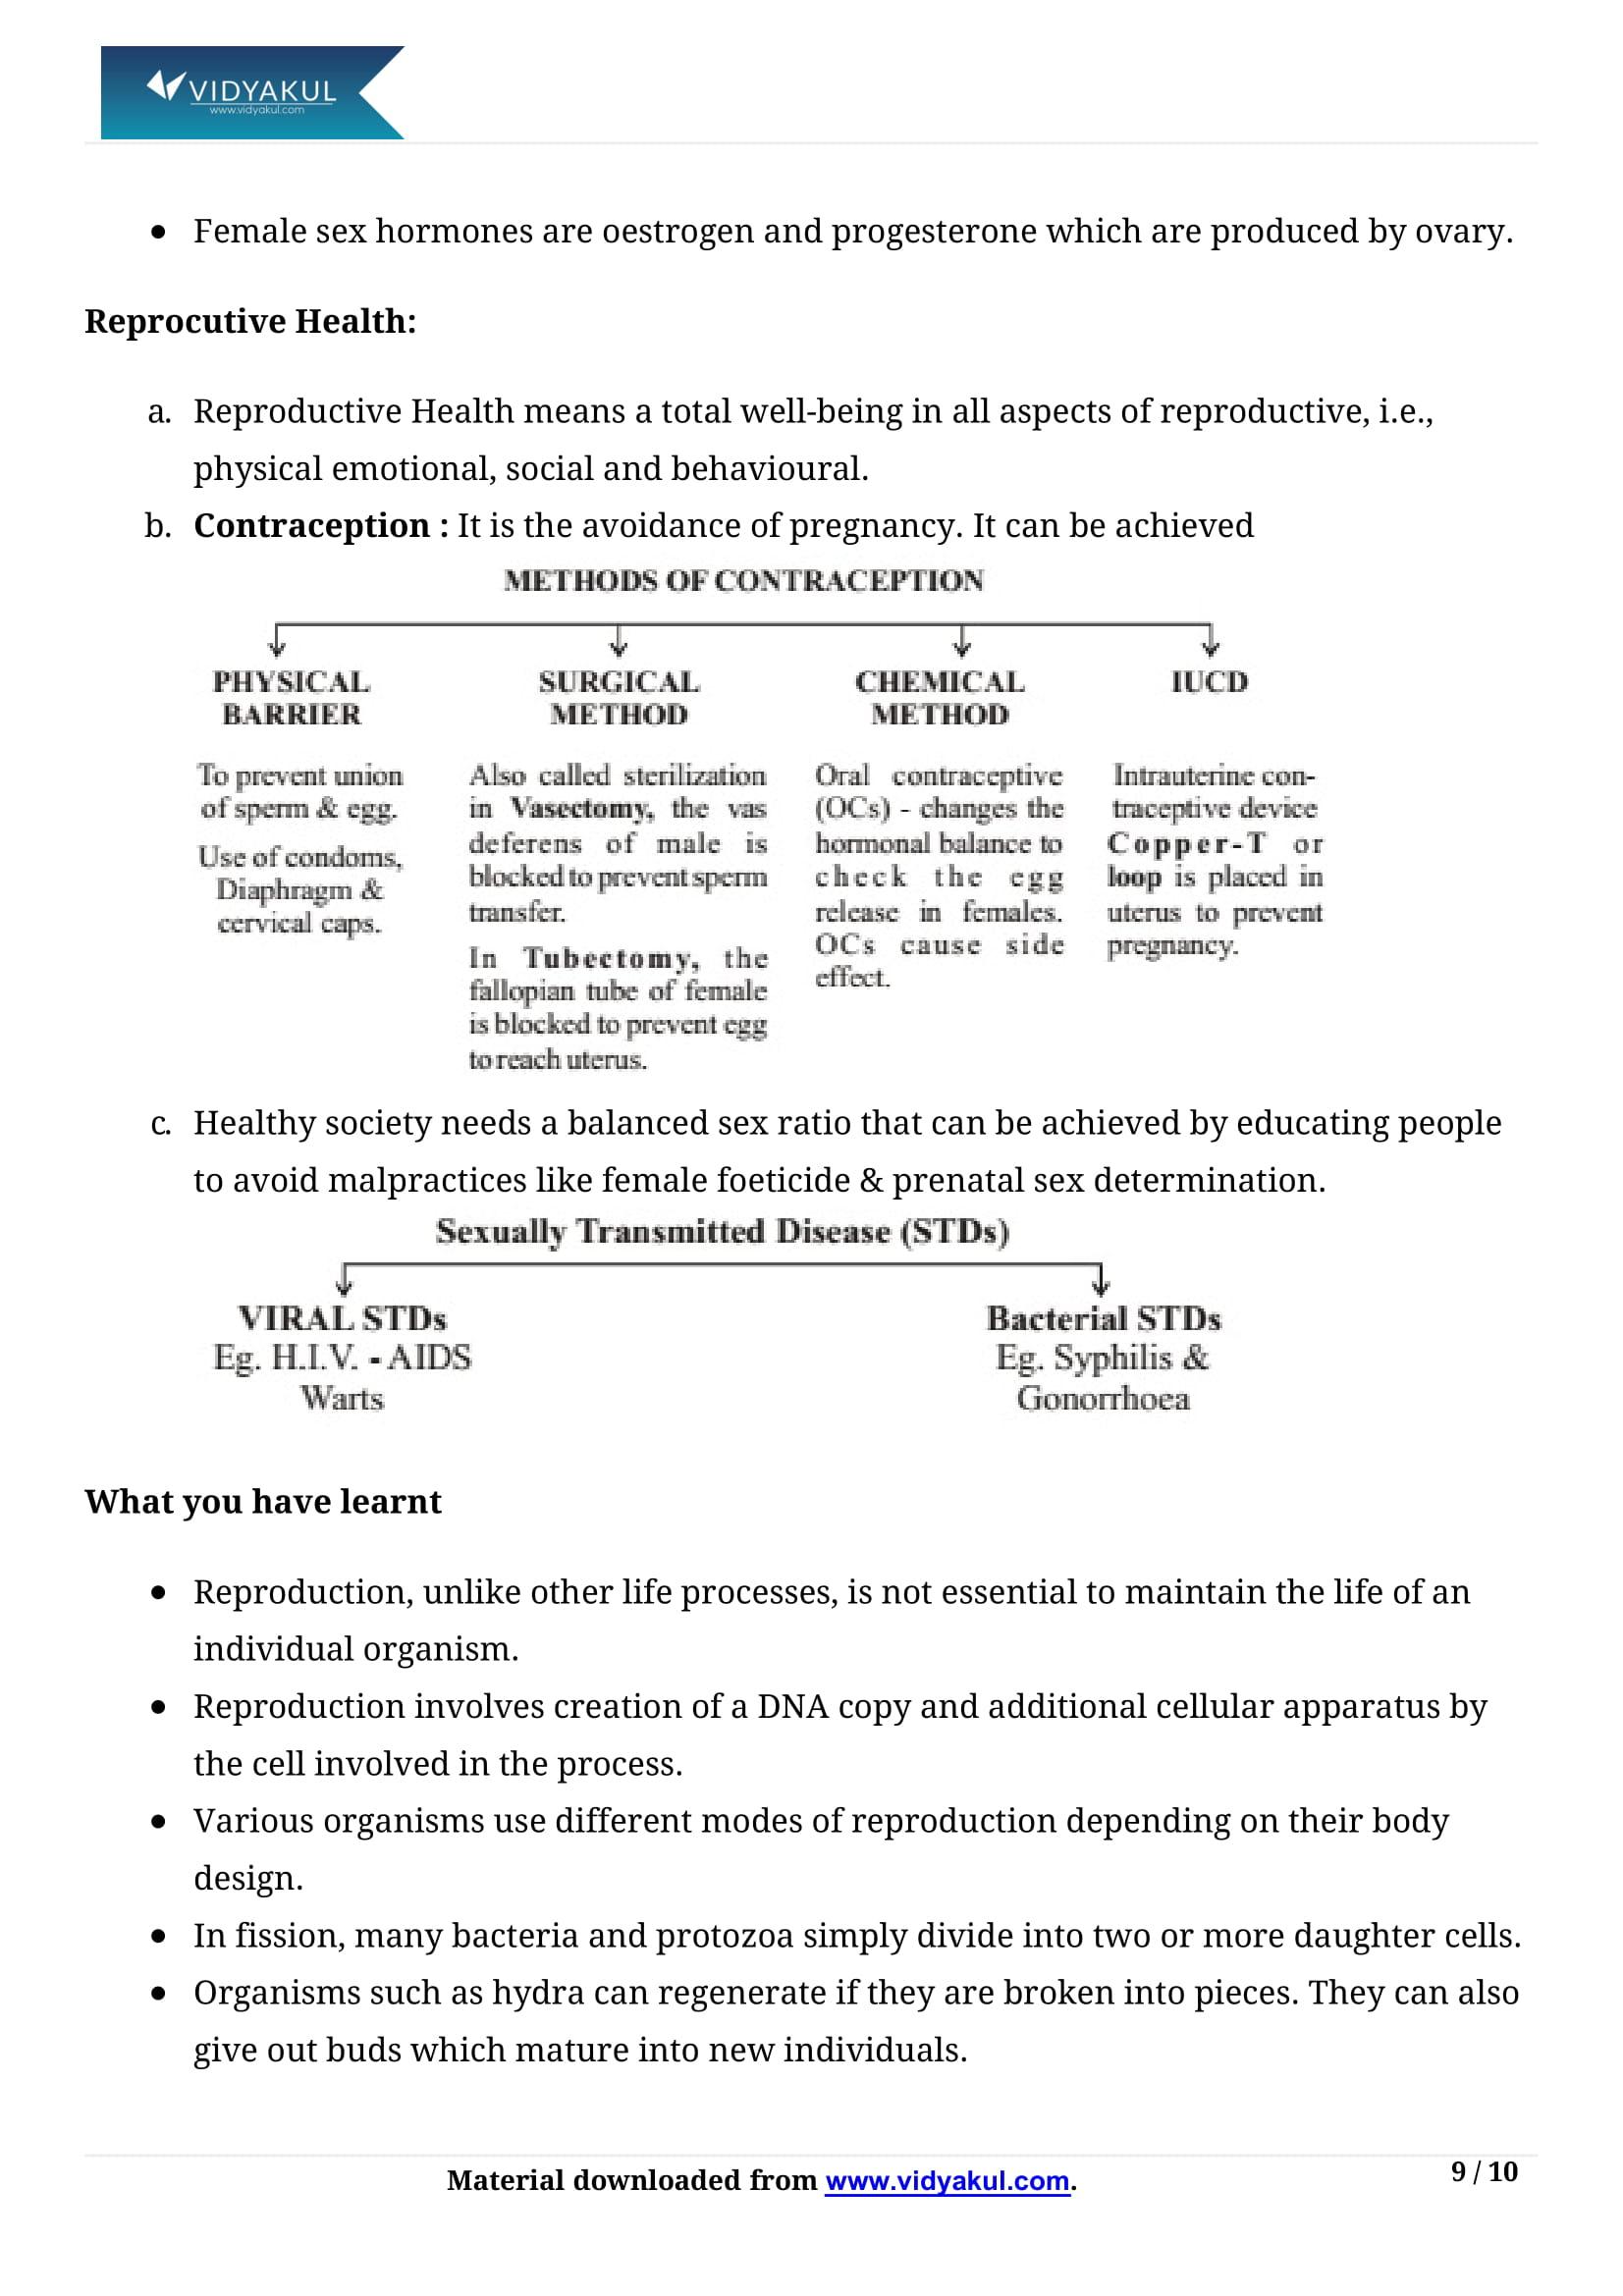 How do Organisms Reproduce? Class 10 Notes   Vidyakul